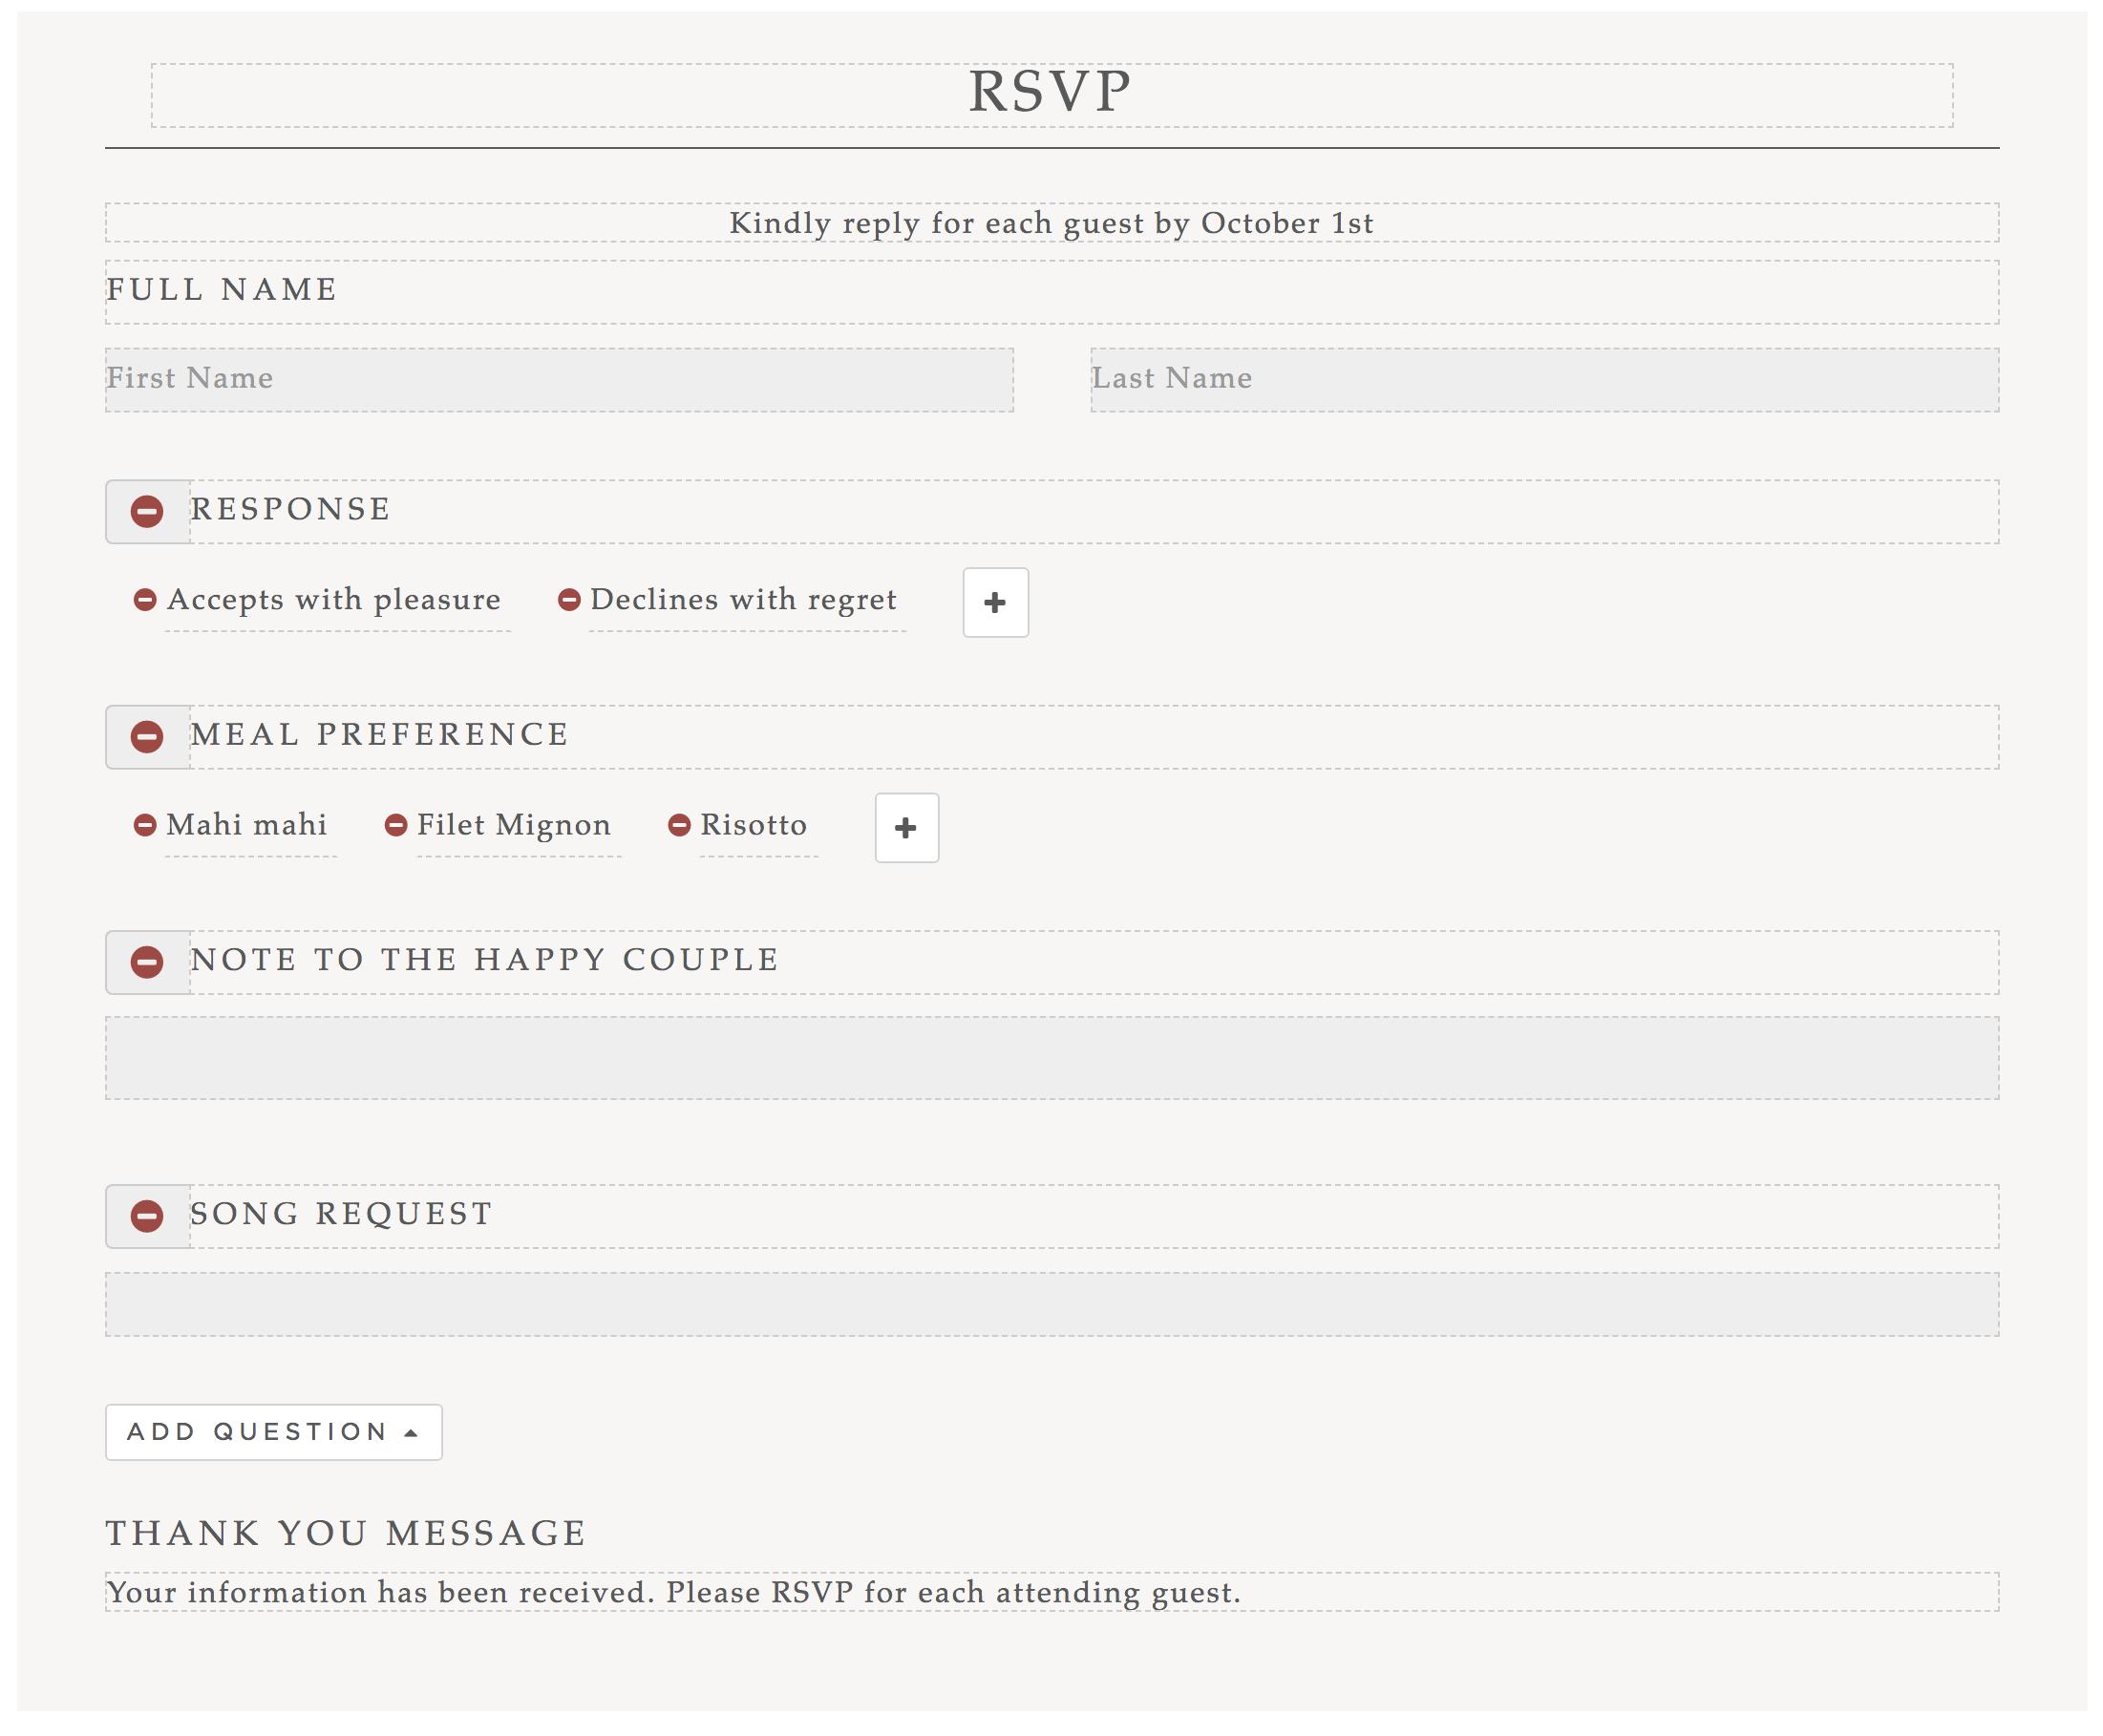 basic invite wedding website sample 6.png